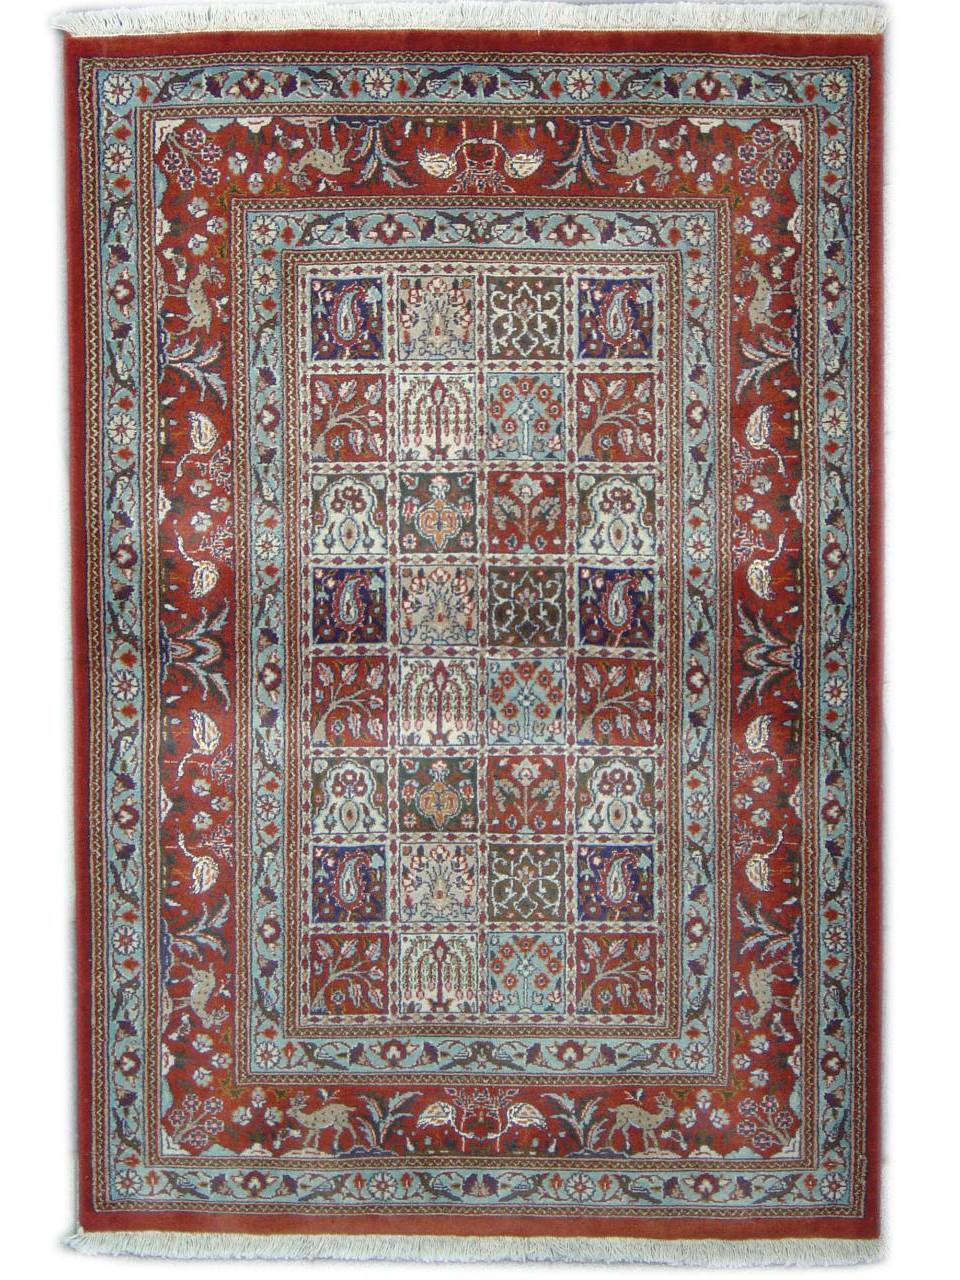 moud jardin tapis persans n 10783 150x102cm. Black Bedroom Furniture Sets. Home Design Ideas